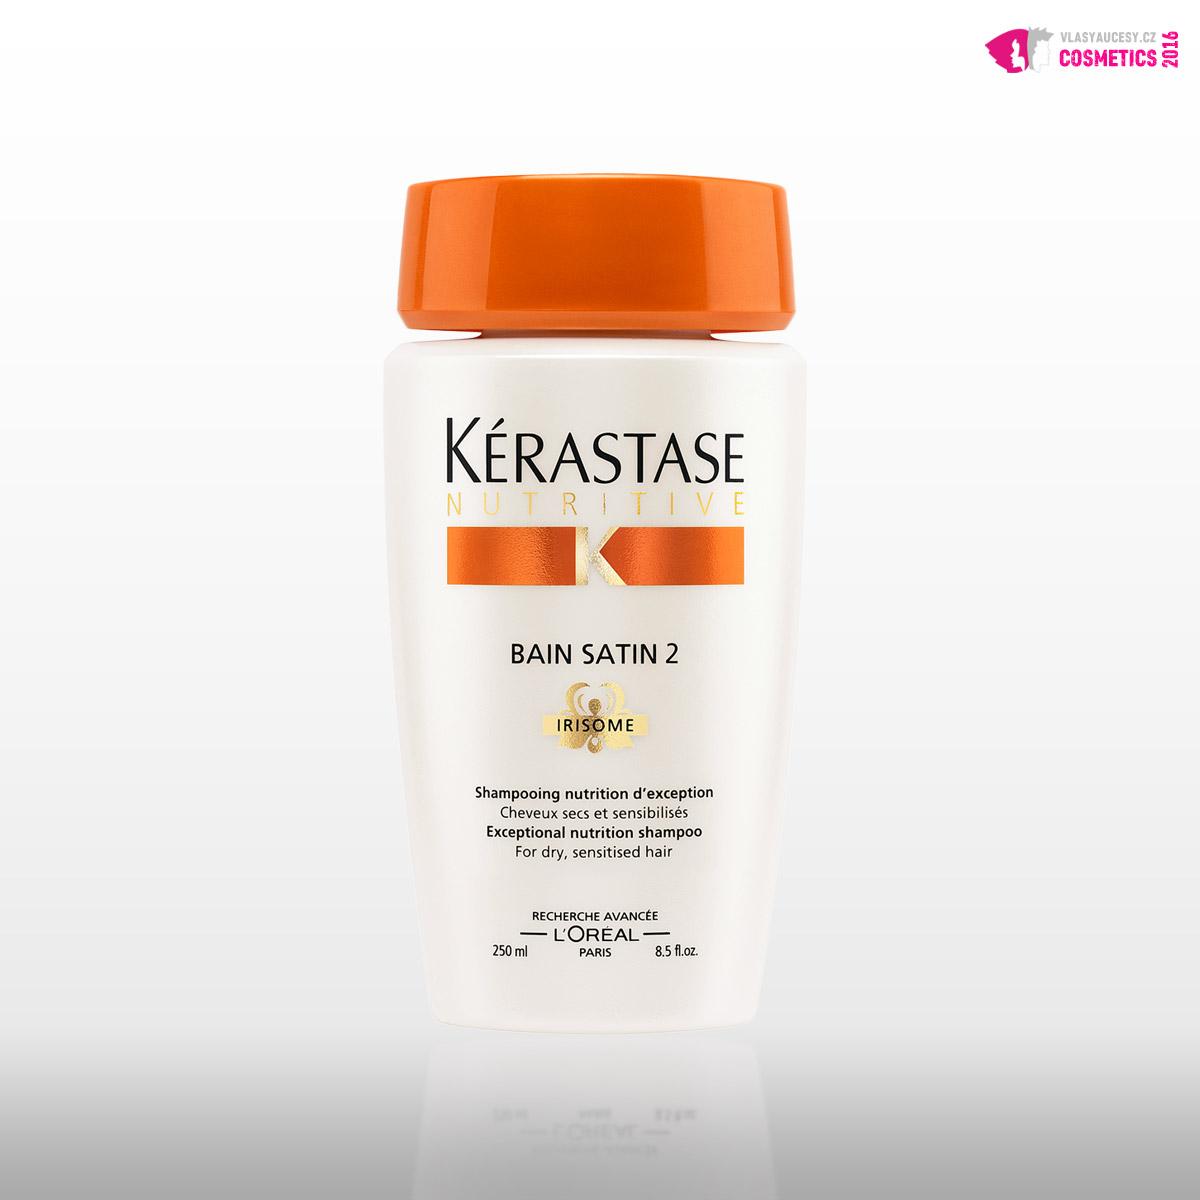 "Šampony Kérastase pro suché vlasy: <a href=""http://www.jdoqocy.com/click-7863143-12225550-1438331618000?url=http%3A%2F%2Fwww.parfums.cz%2Fkerastase%2Fnutritive-sampon-pro-suche-vlasy%2F&cjsku=KERNUTW_KSHA20"" target=""_blank""> Kérastase Nutritive šampon pro suché vlasy, cena od 482 Kč. </a>"